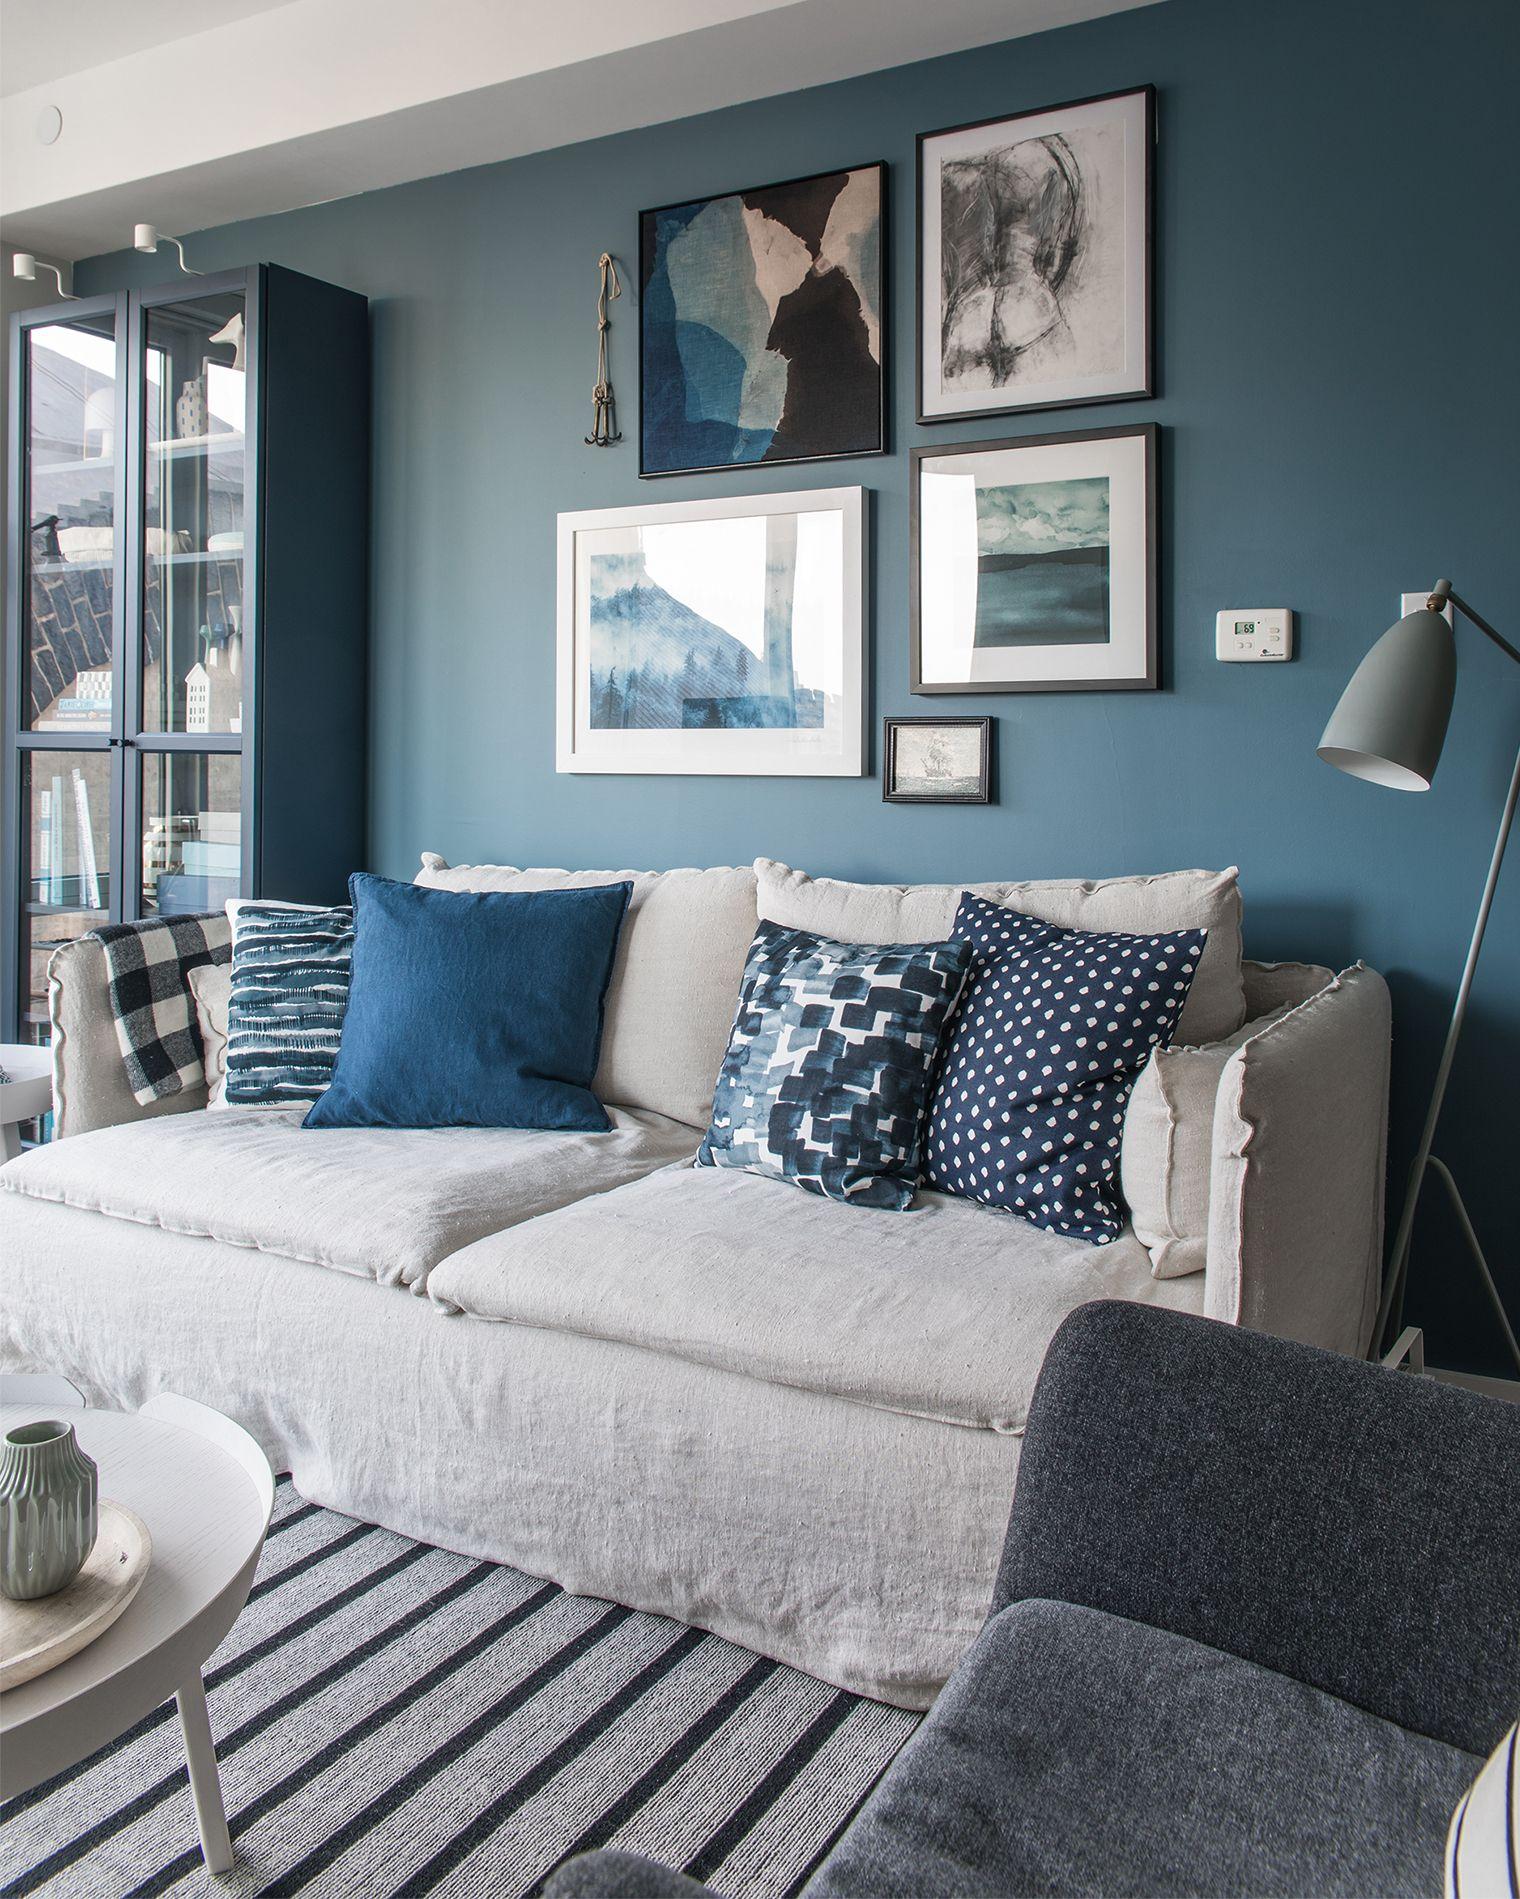 NYC Apartment Autumn Design Updates: Bemz IKEA SÖDERHAMN Sofa ...